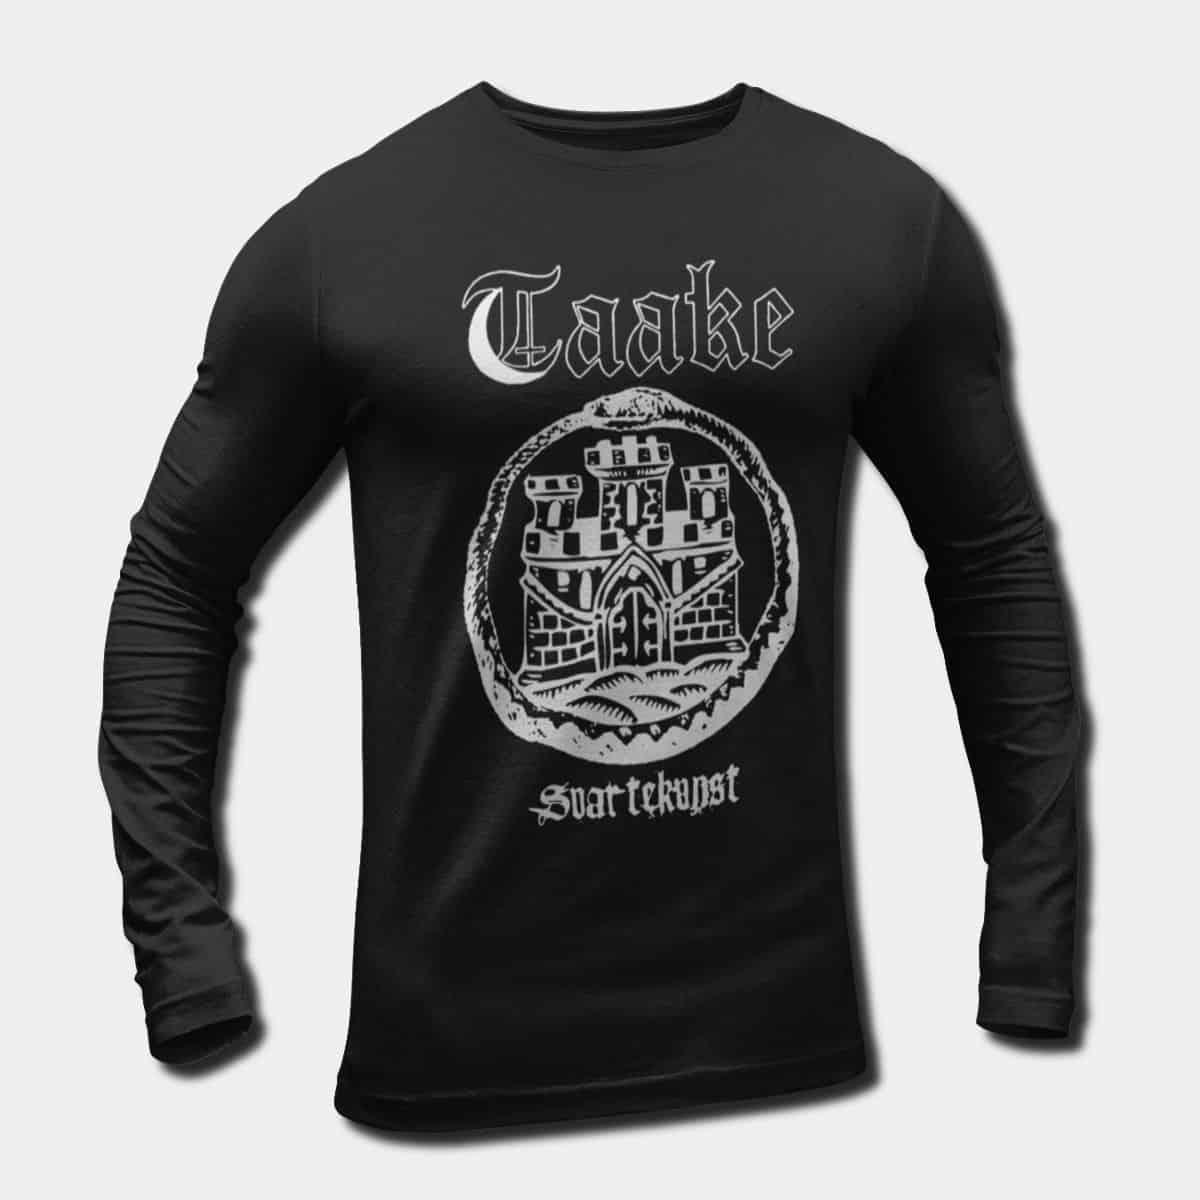 886947c4 Taake Band Long Sleeve T-Shirt, Taake Svartekunst Longsleeve Tee ...